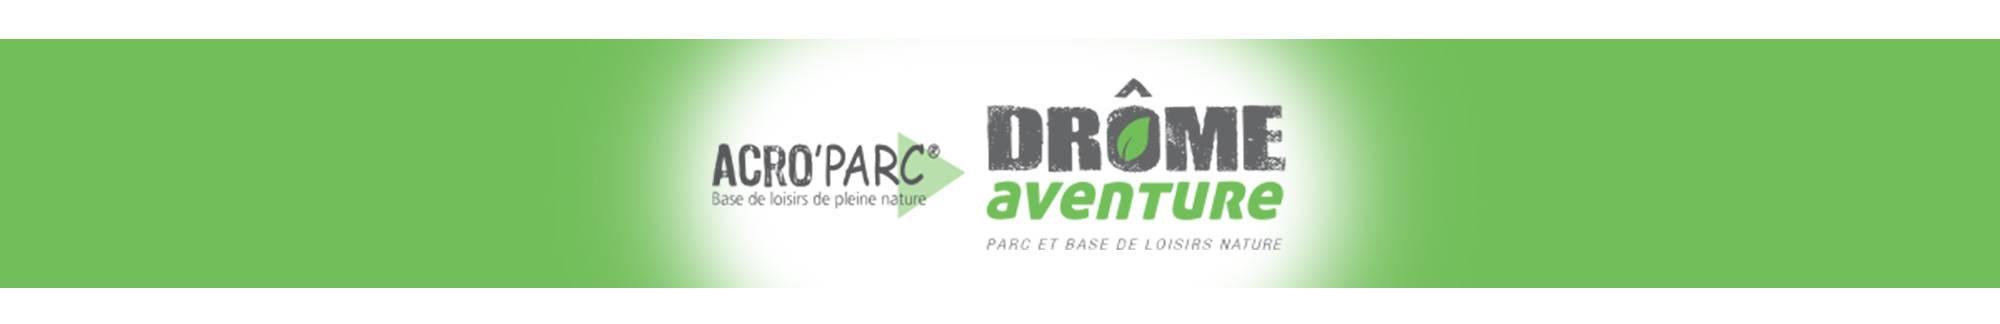 Drôme Aventure base de loisirs en Drôme